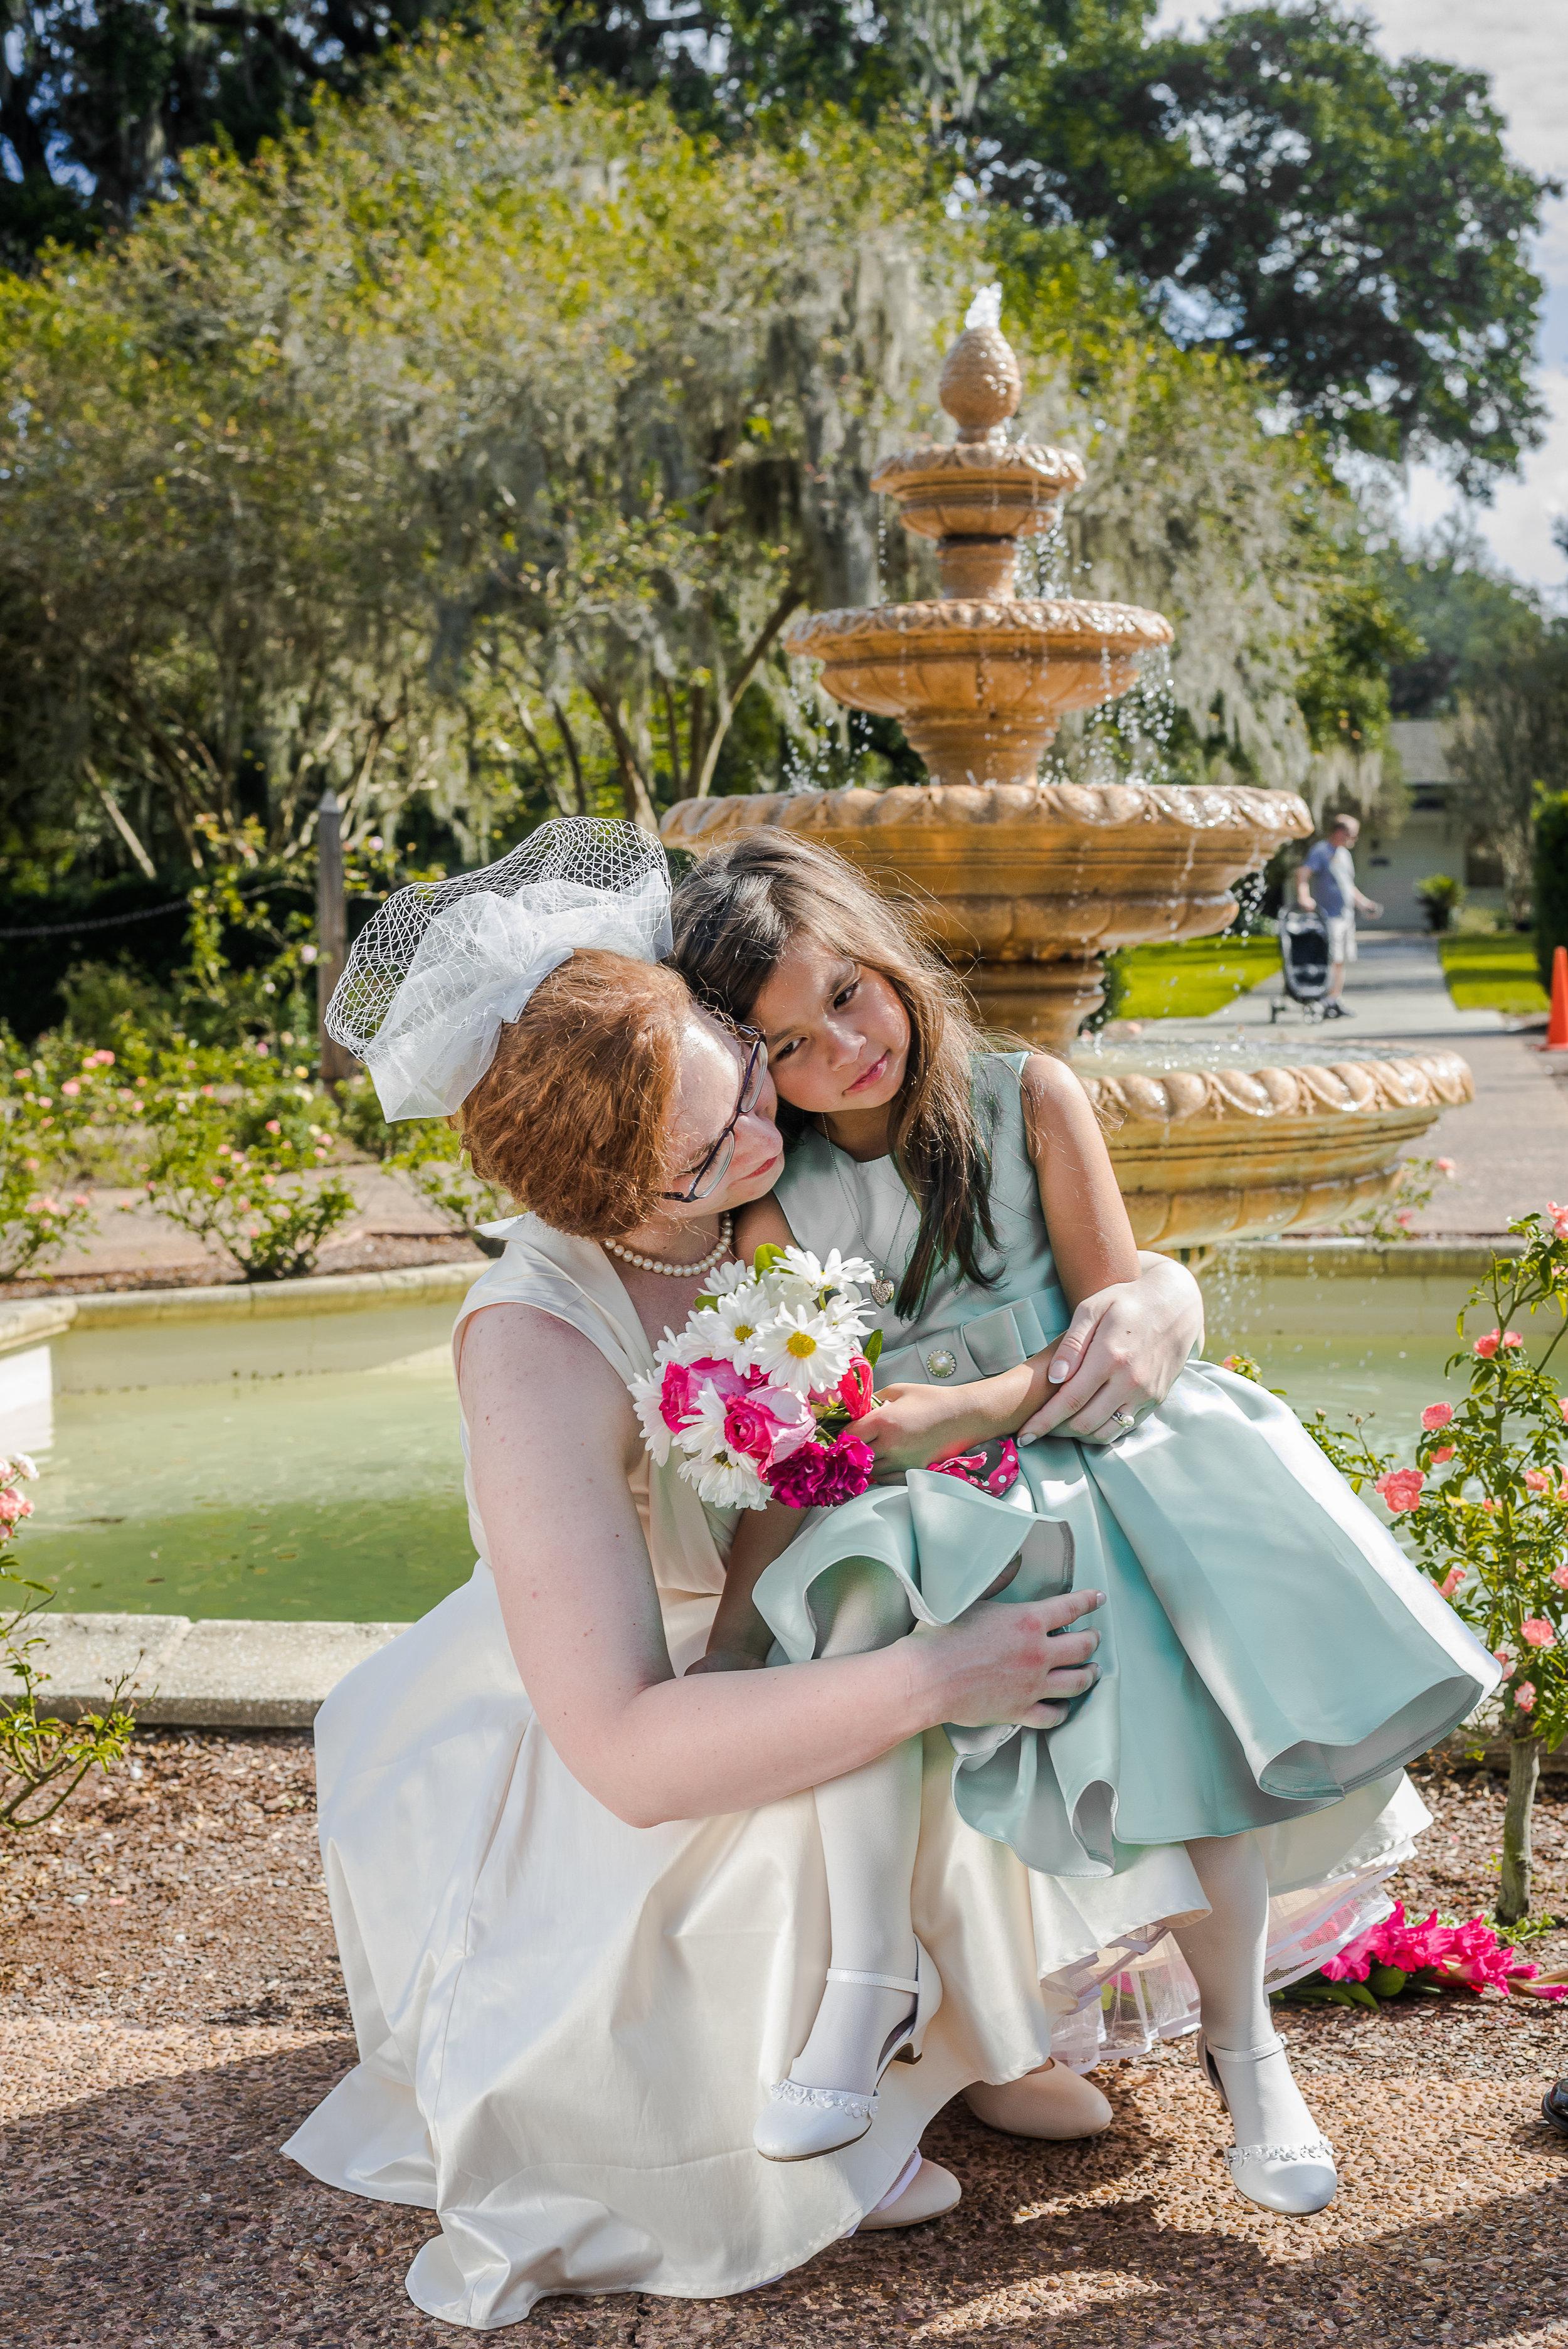 herry-garden-wedding-1-16.jpg